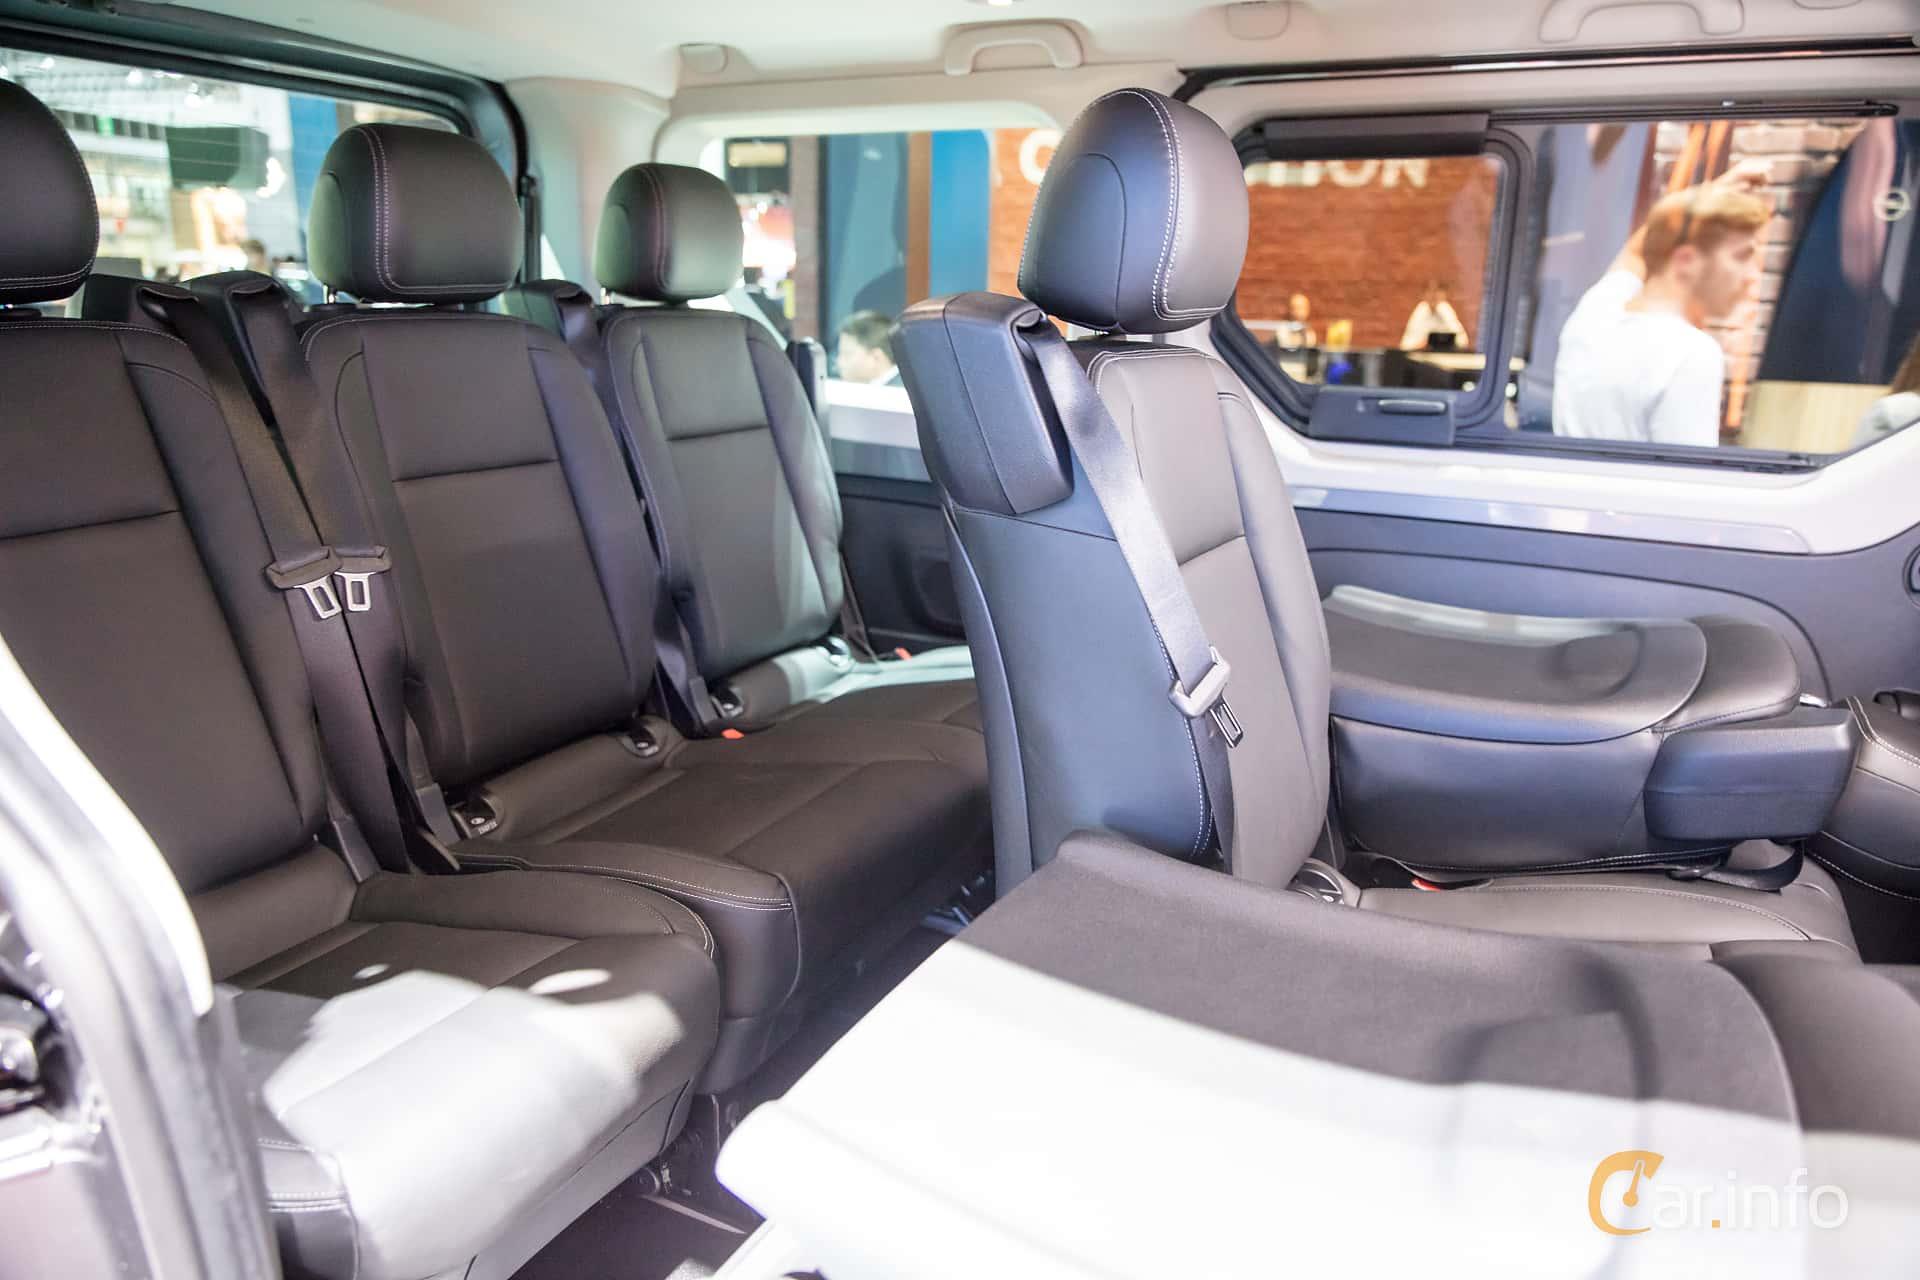 7 images of Opel Vivaro Combi 1.6 CDTI BIturbo Manual, 145hp, 2018 ...